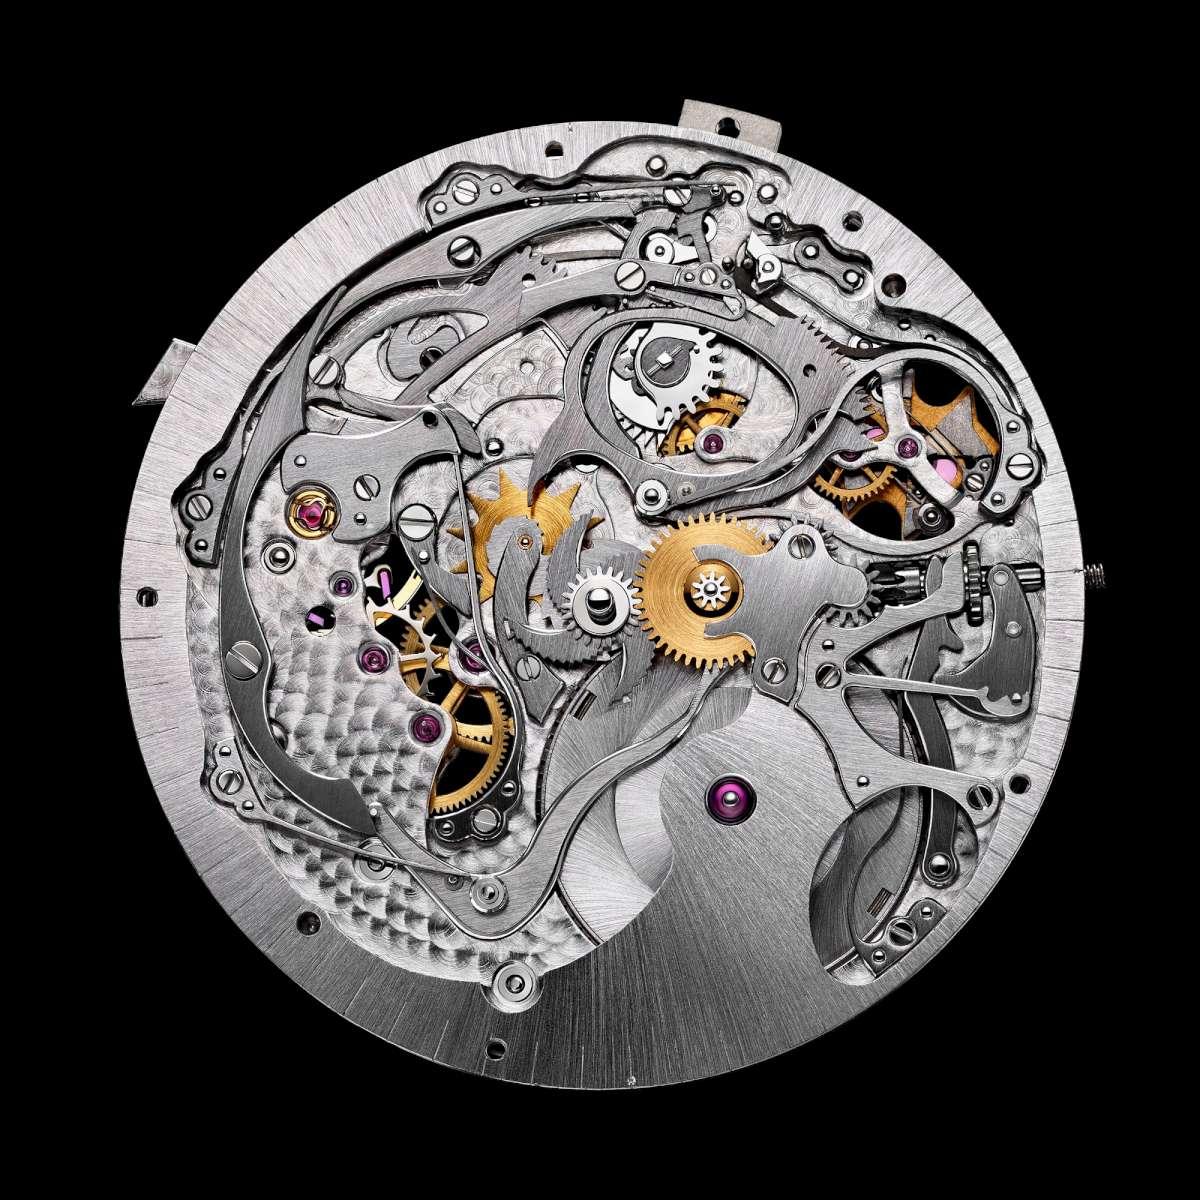 Vacheron Constantin Patrimony ultra-thin calibre 1731 minute repeater